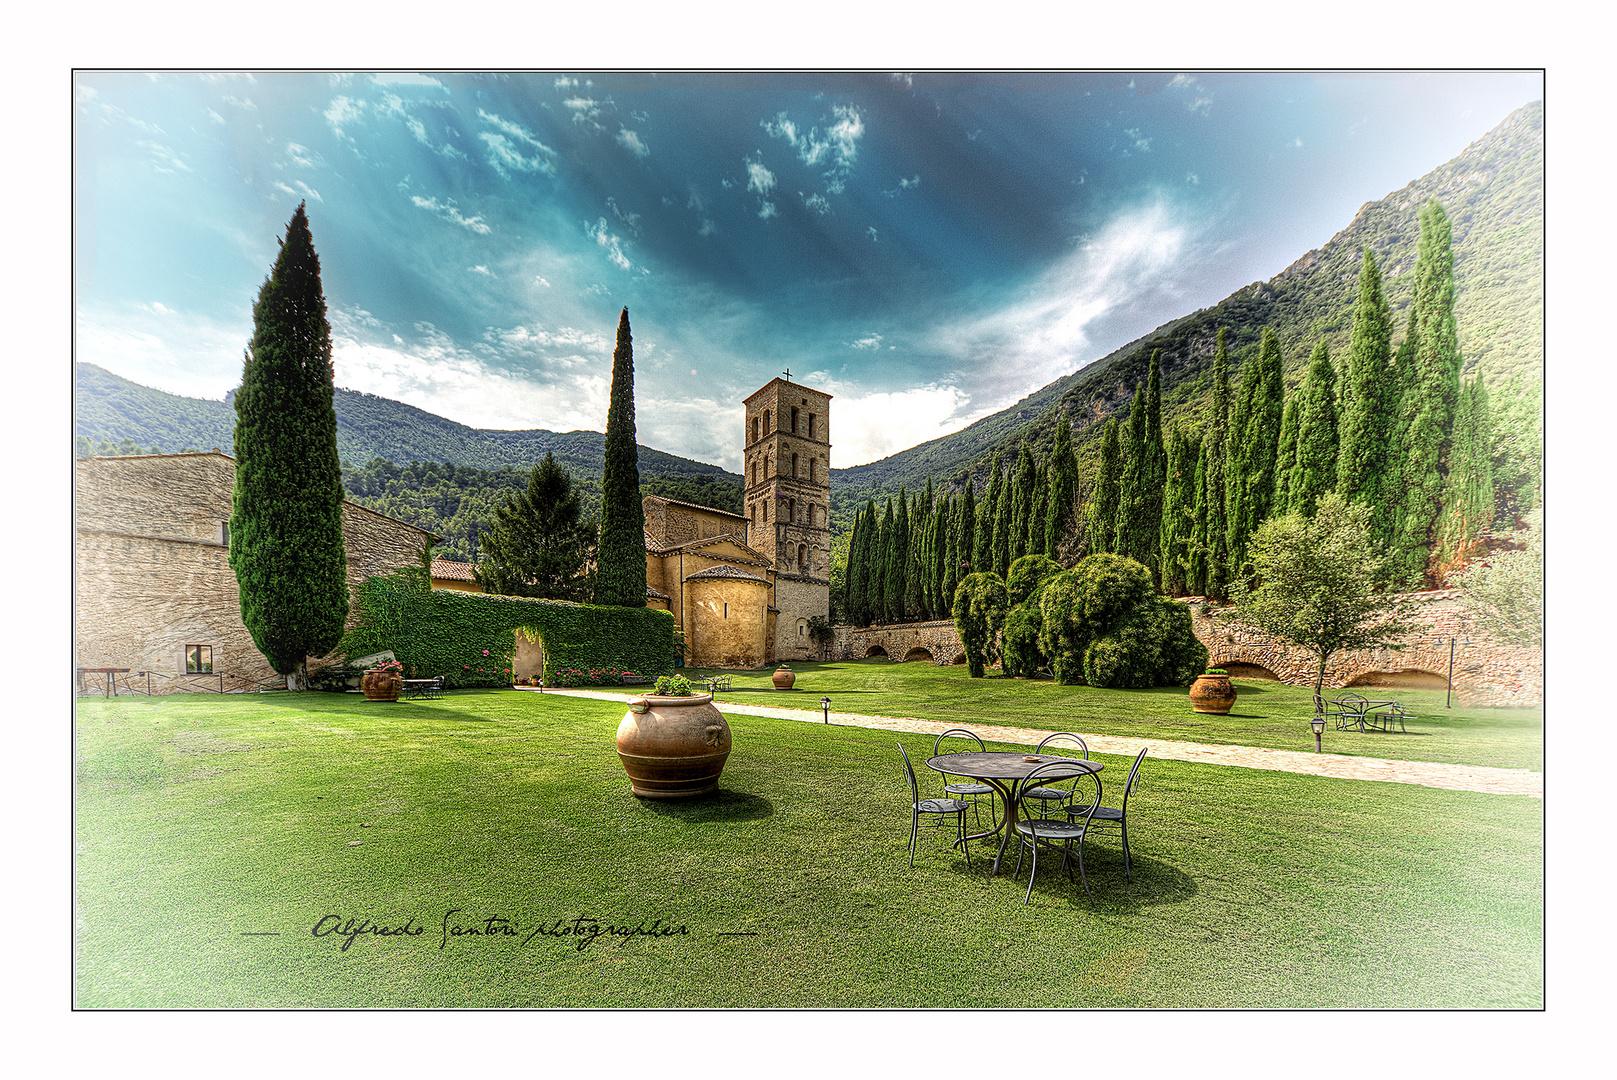 San Pietro in Valle